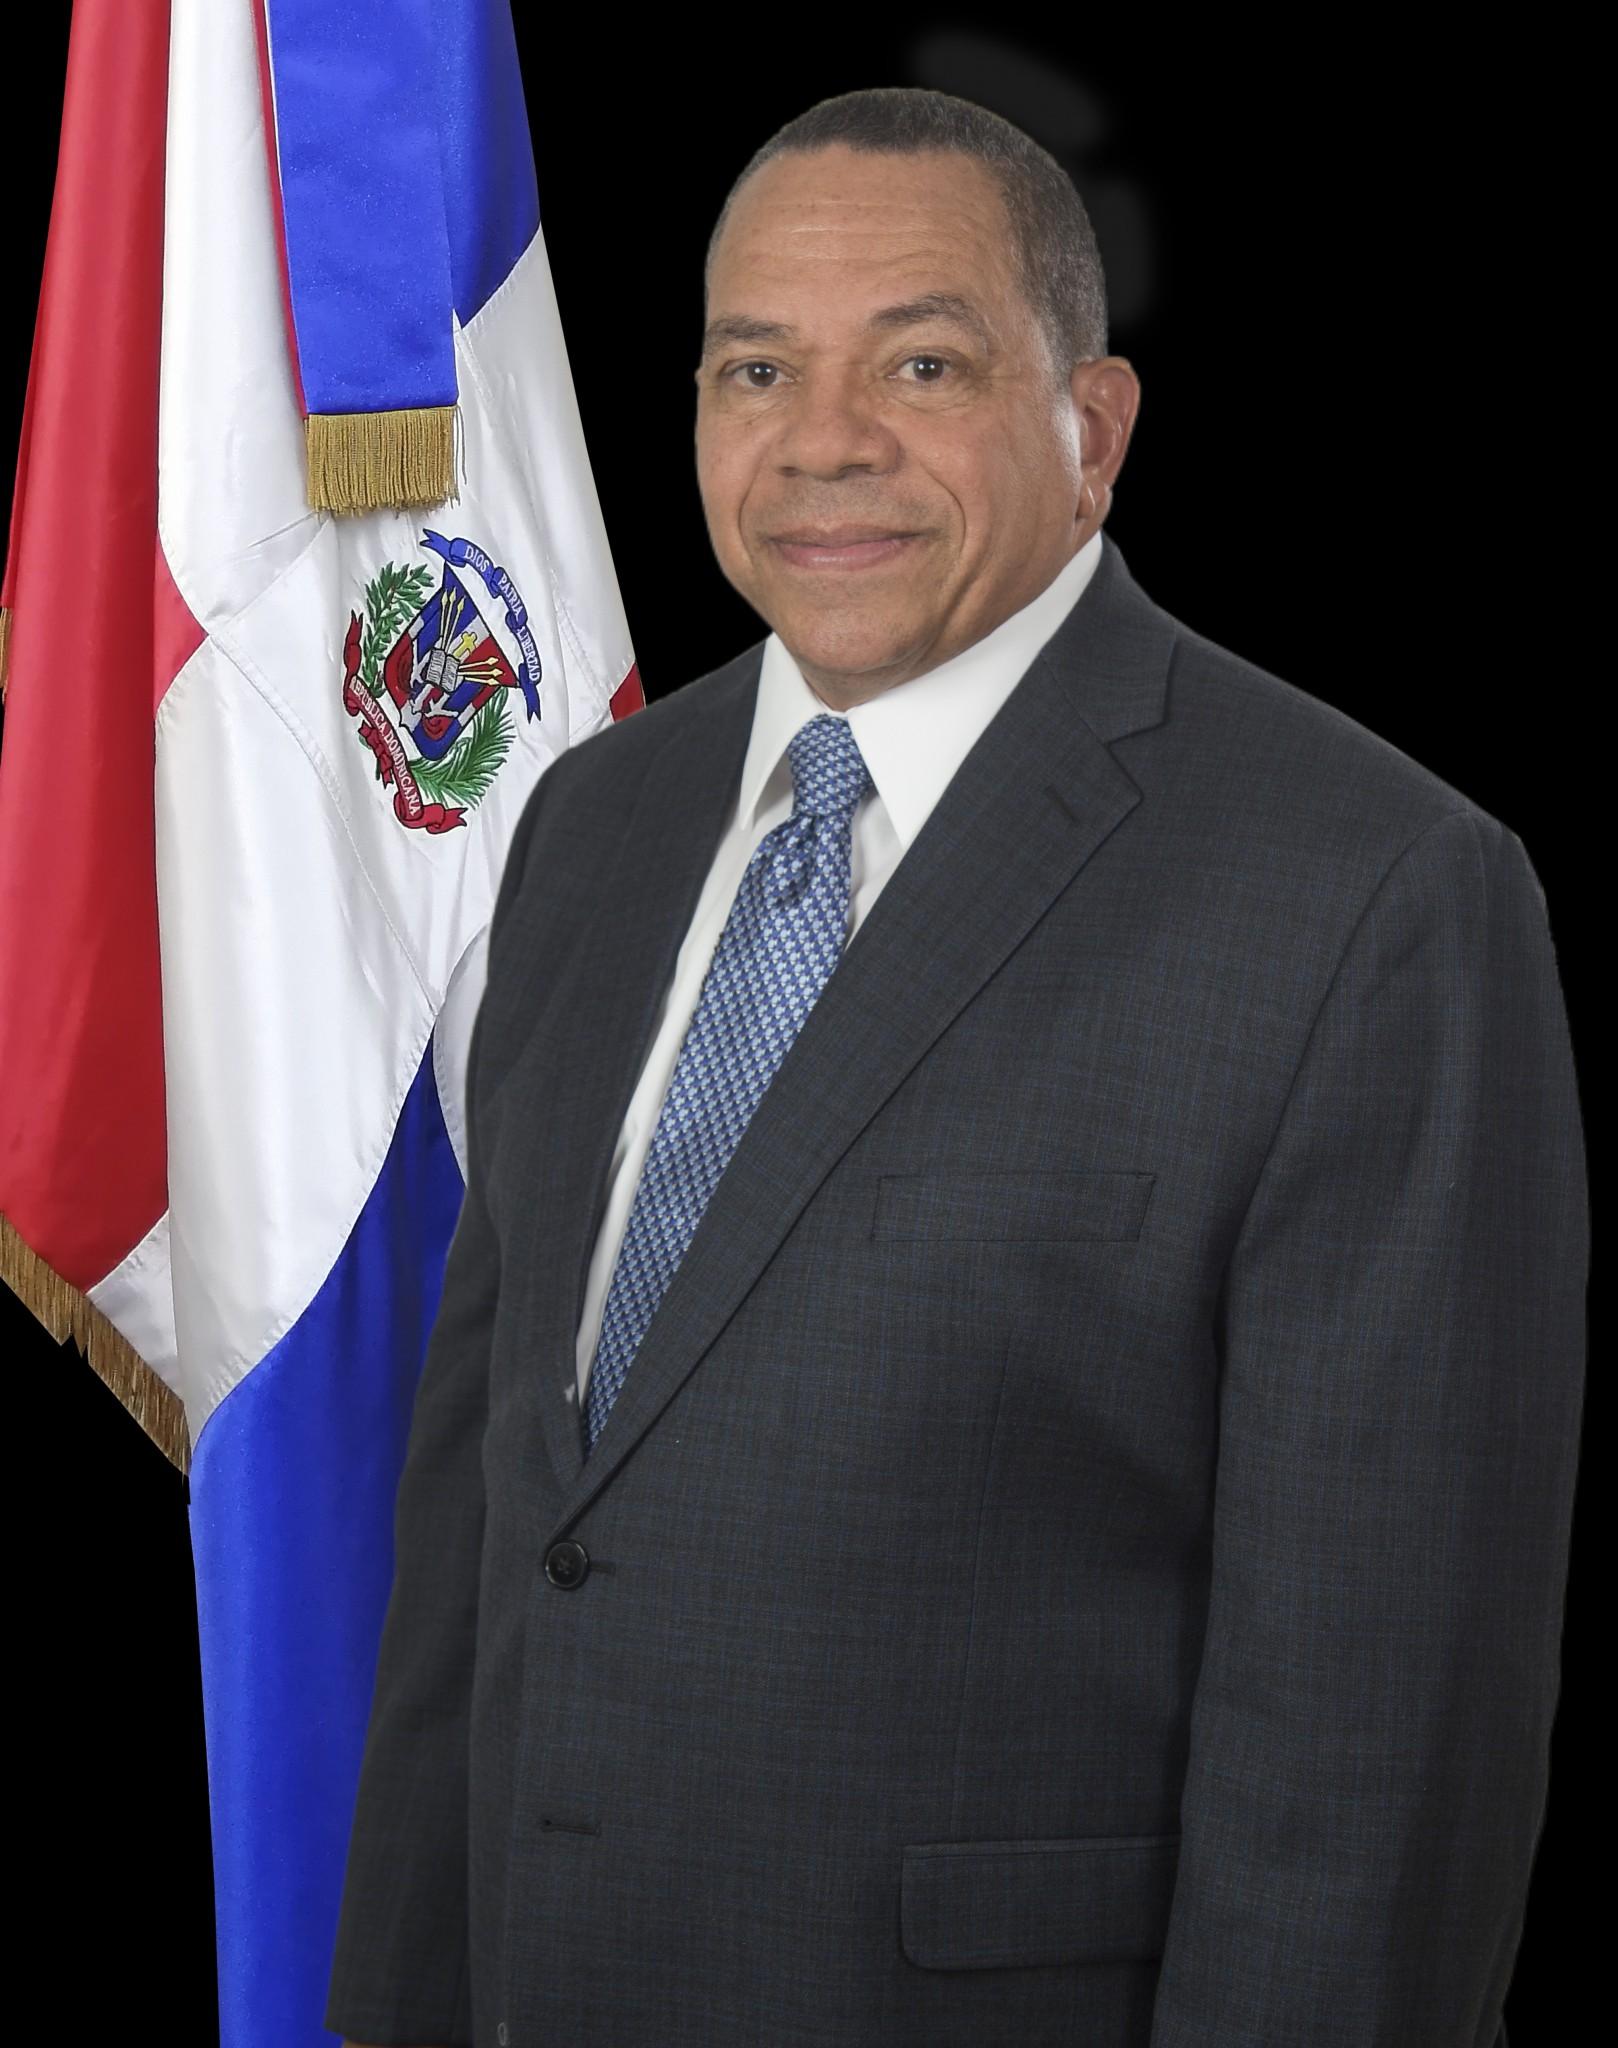 Embajador Héctor Galván